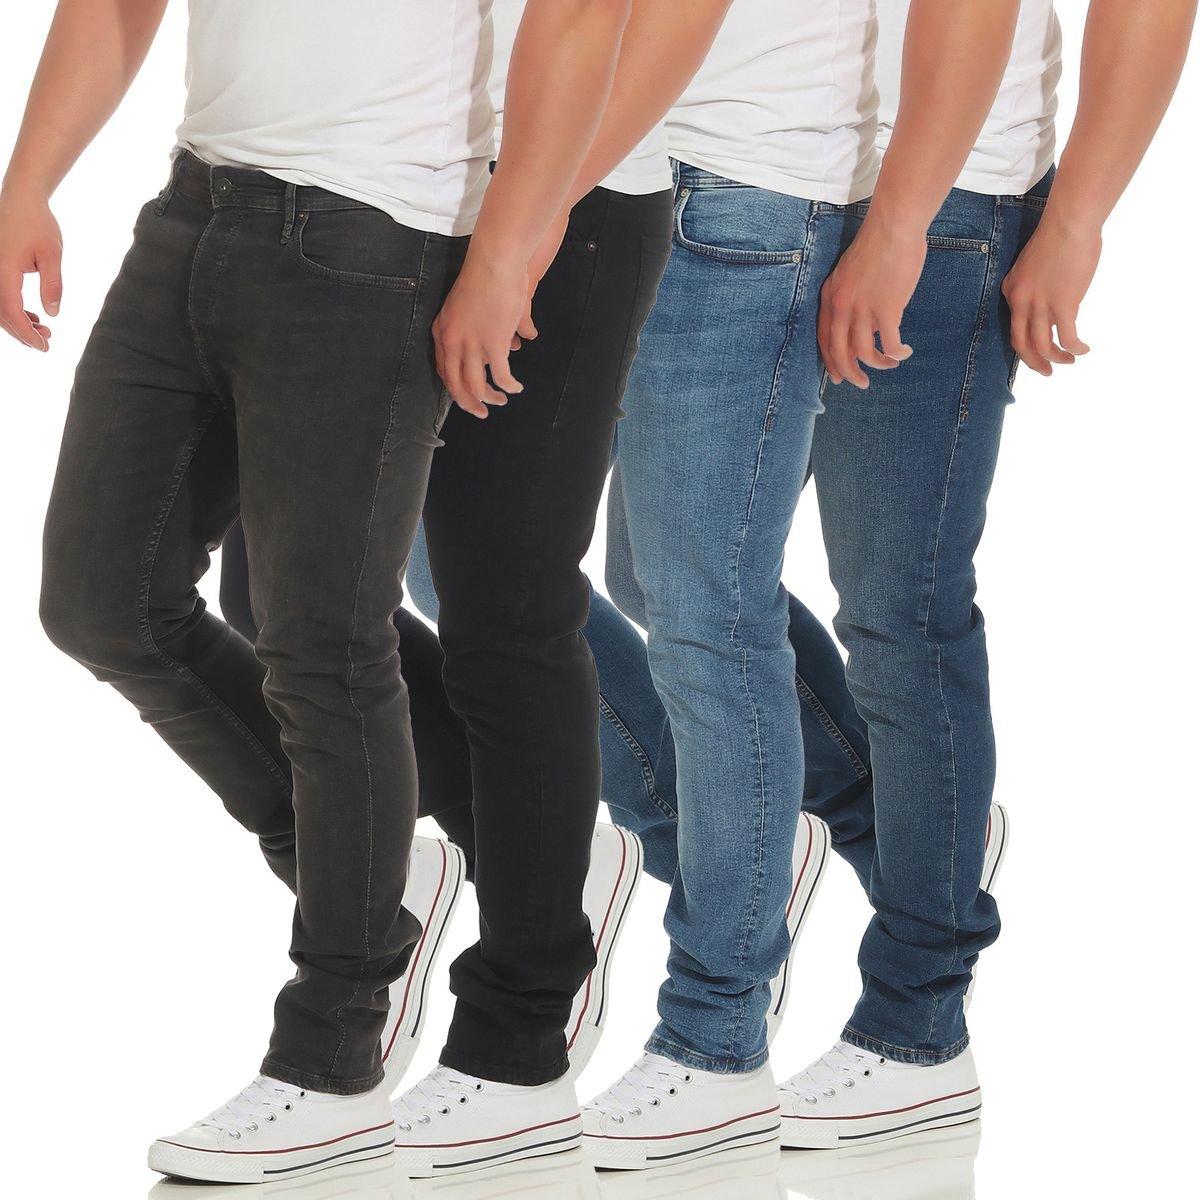 9c4e50cbd22a9e JACK & JONES Herren Slim Jeans: Amazon.de: Bekleidung